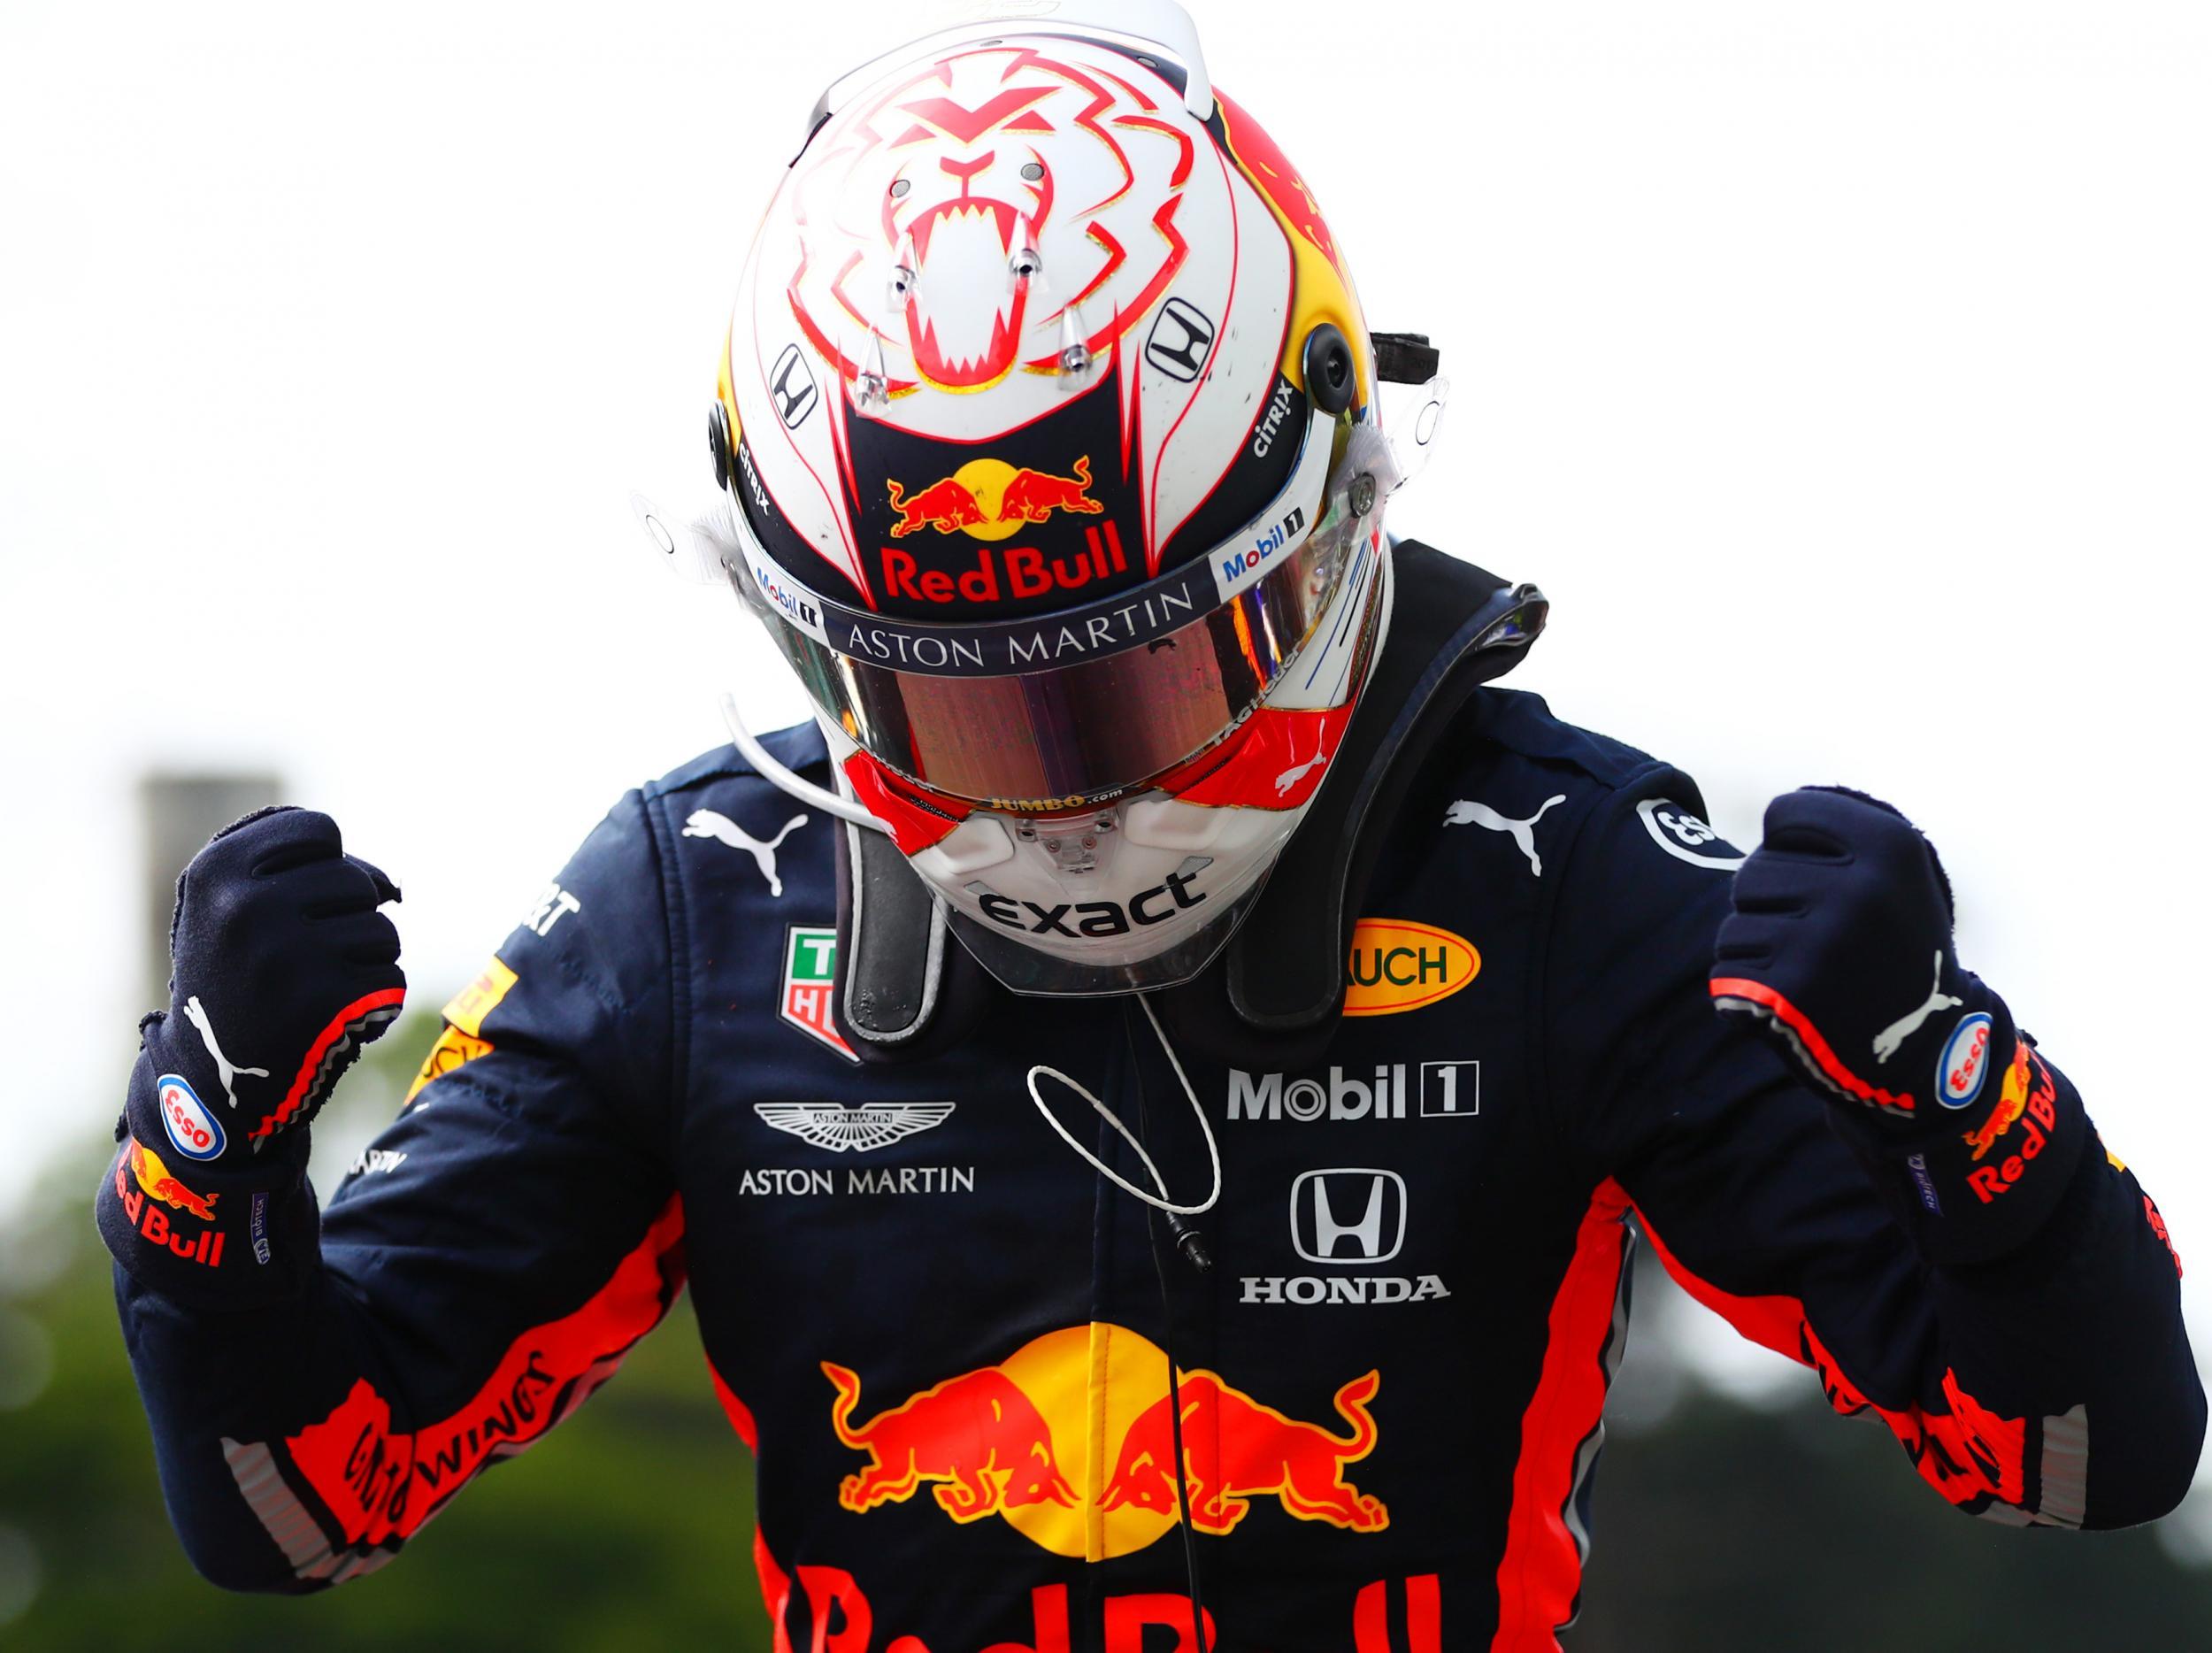 F1: Max Verstappen passes Lewis Hamilton twice to win thrilling Brazilian Grand Prix 2019